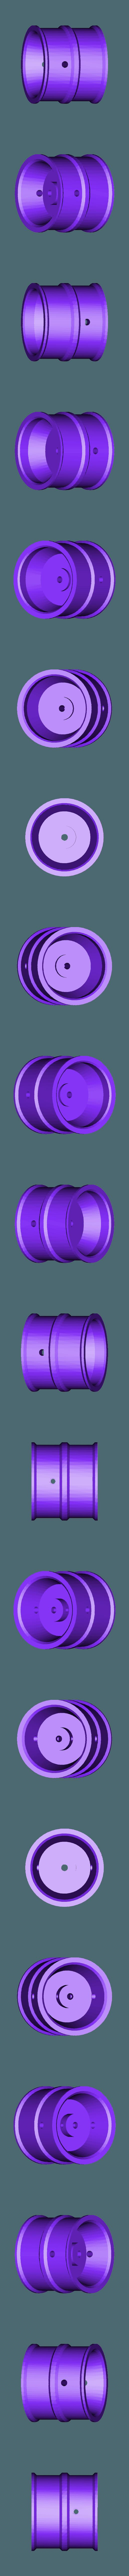 RearDoubleRim.STL Download free STL file Printed truck: Rims • 3D printing template, MrCrankyface